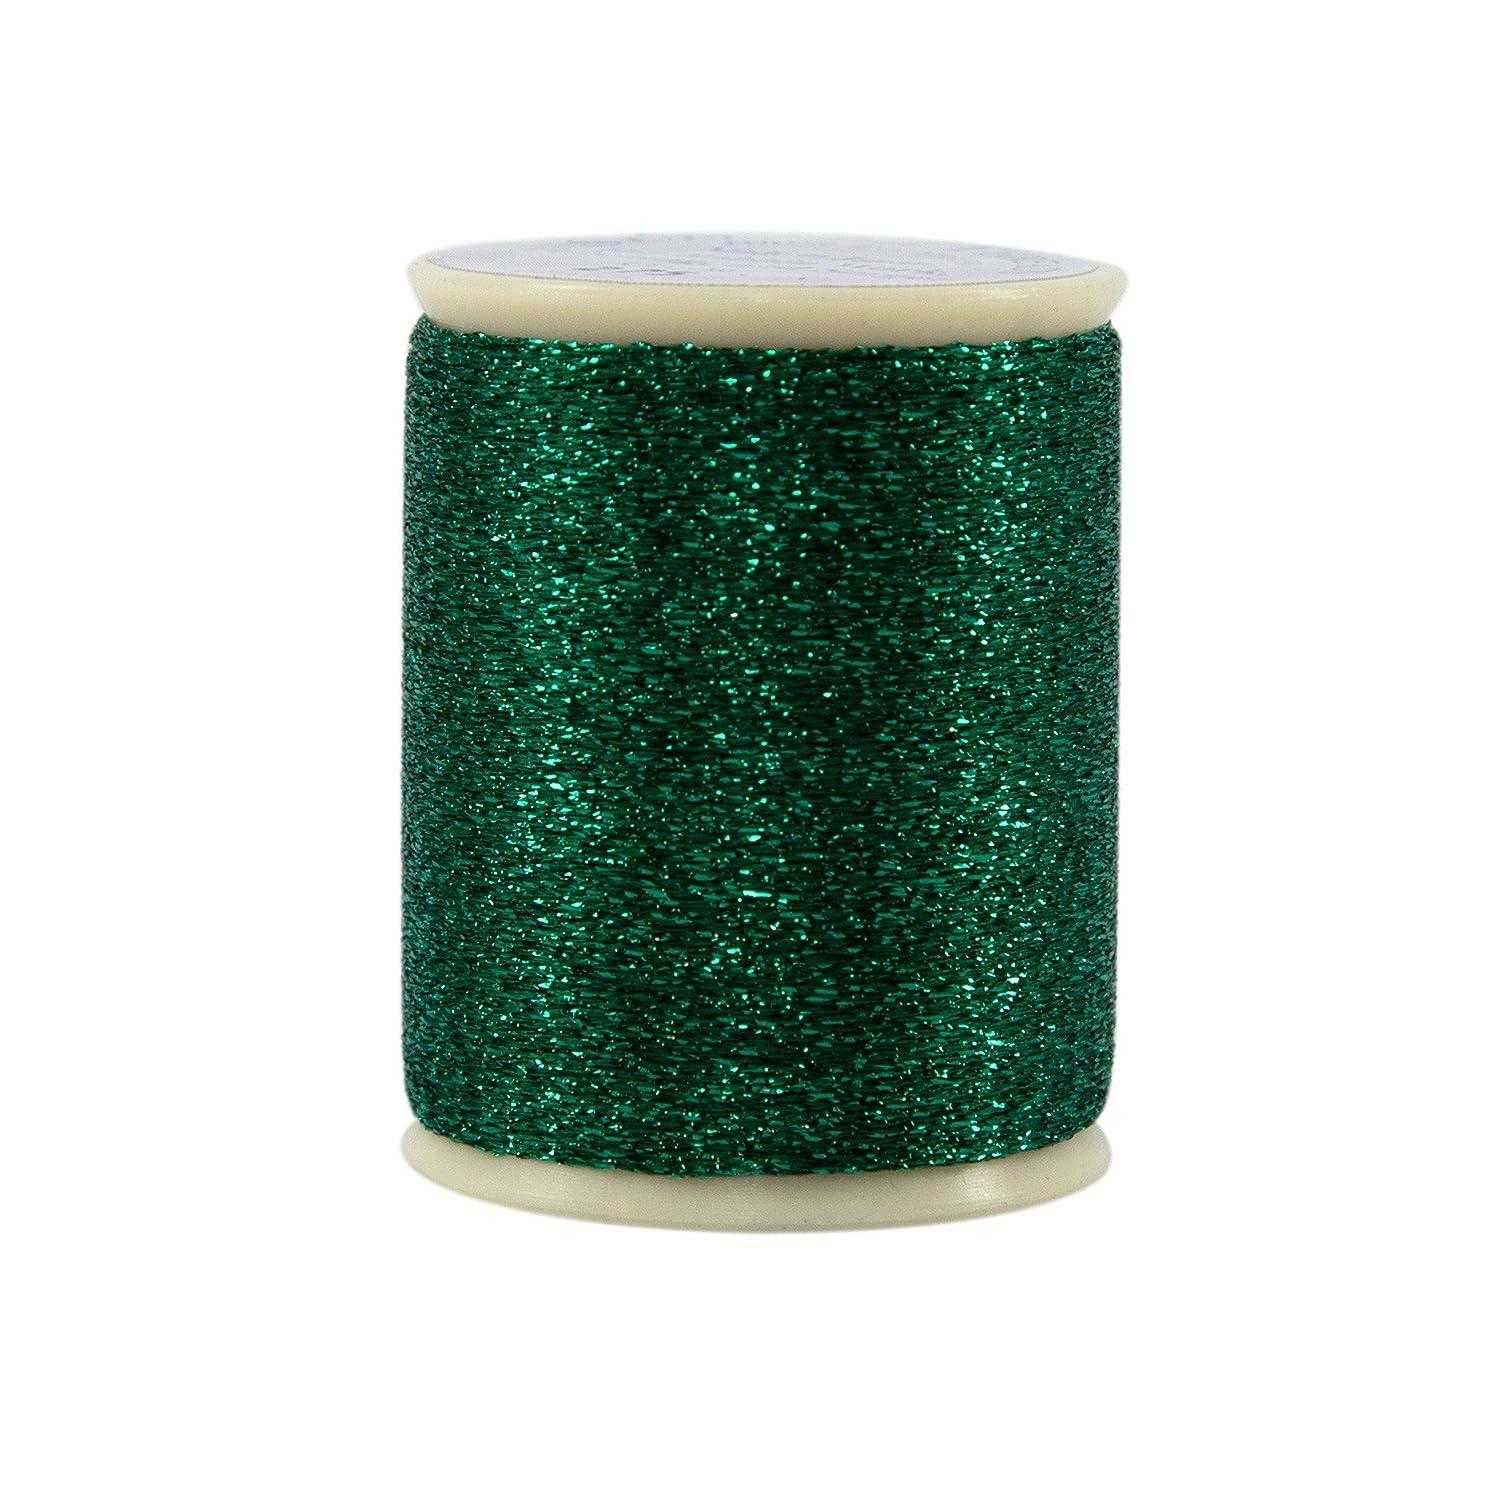 Superior Threads 120012XX275 Razzle Dazzle Chariot of Fire 8W Polyester Metallic Thread, 110 yd